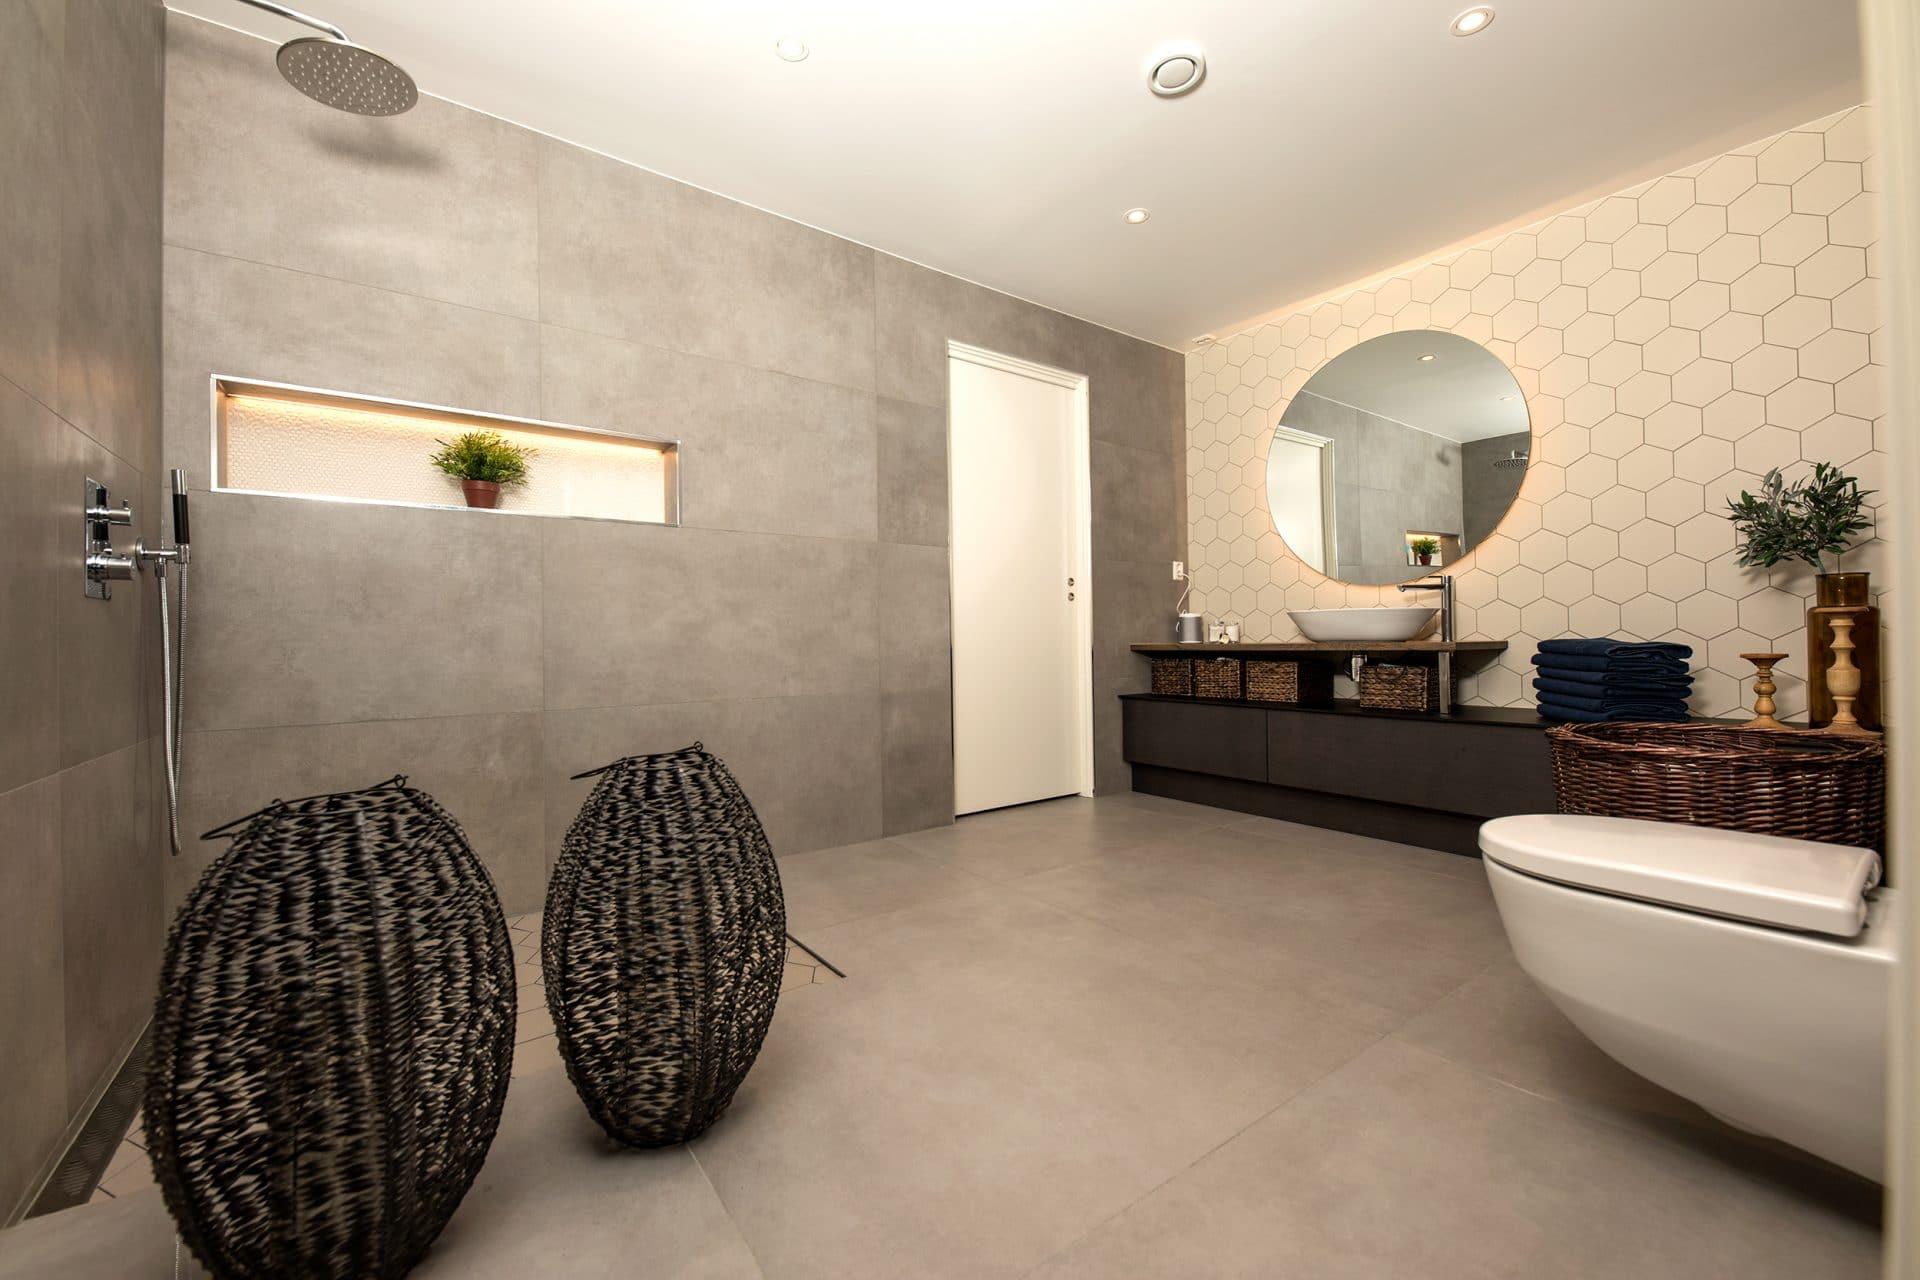 Moderne bad med sekskantede fliser og dusjhjørne